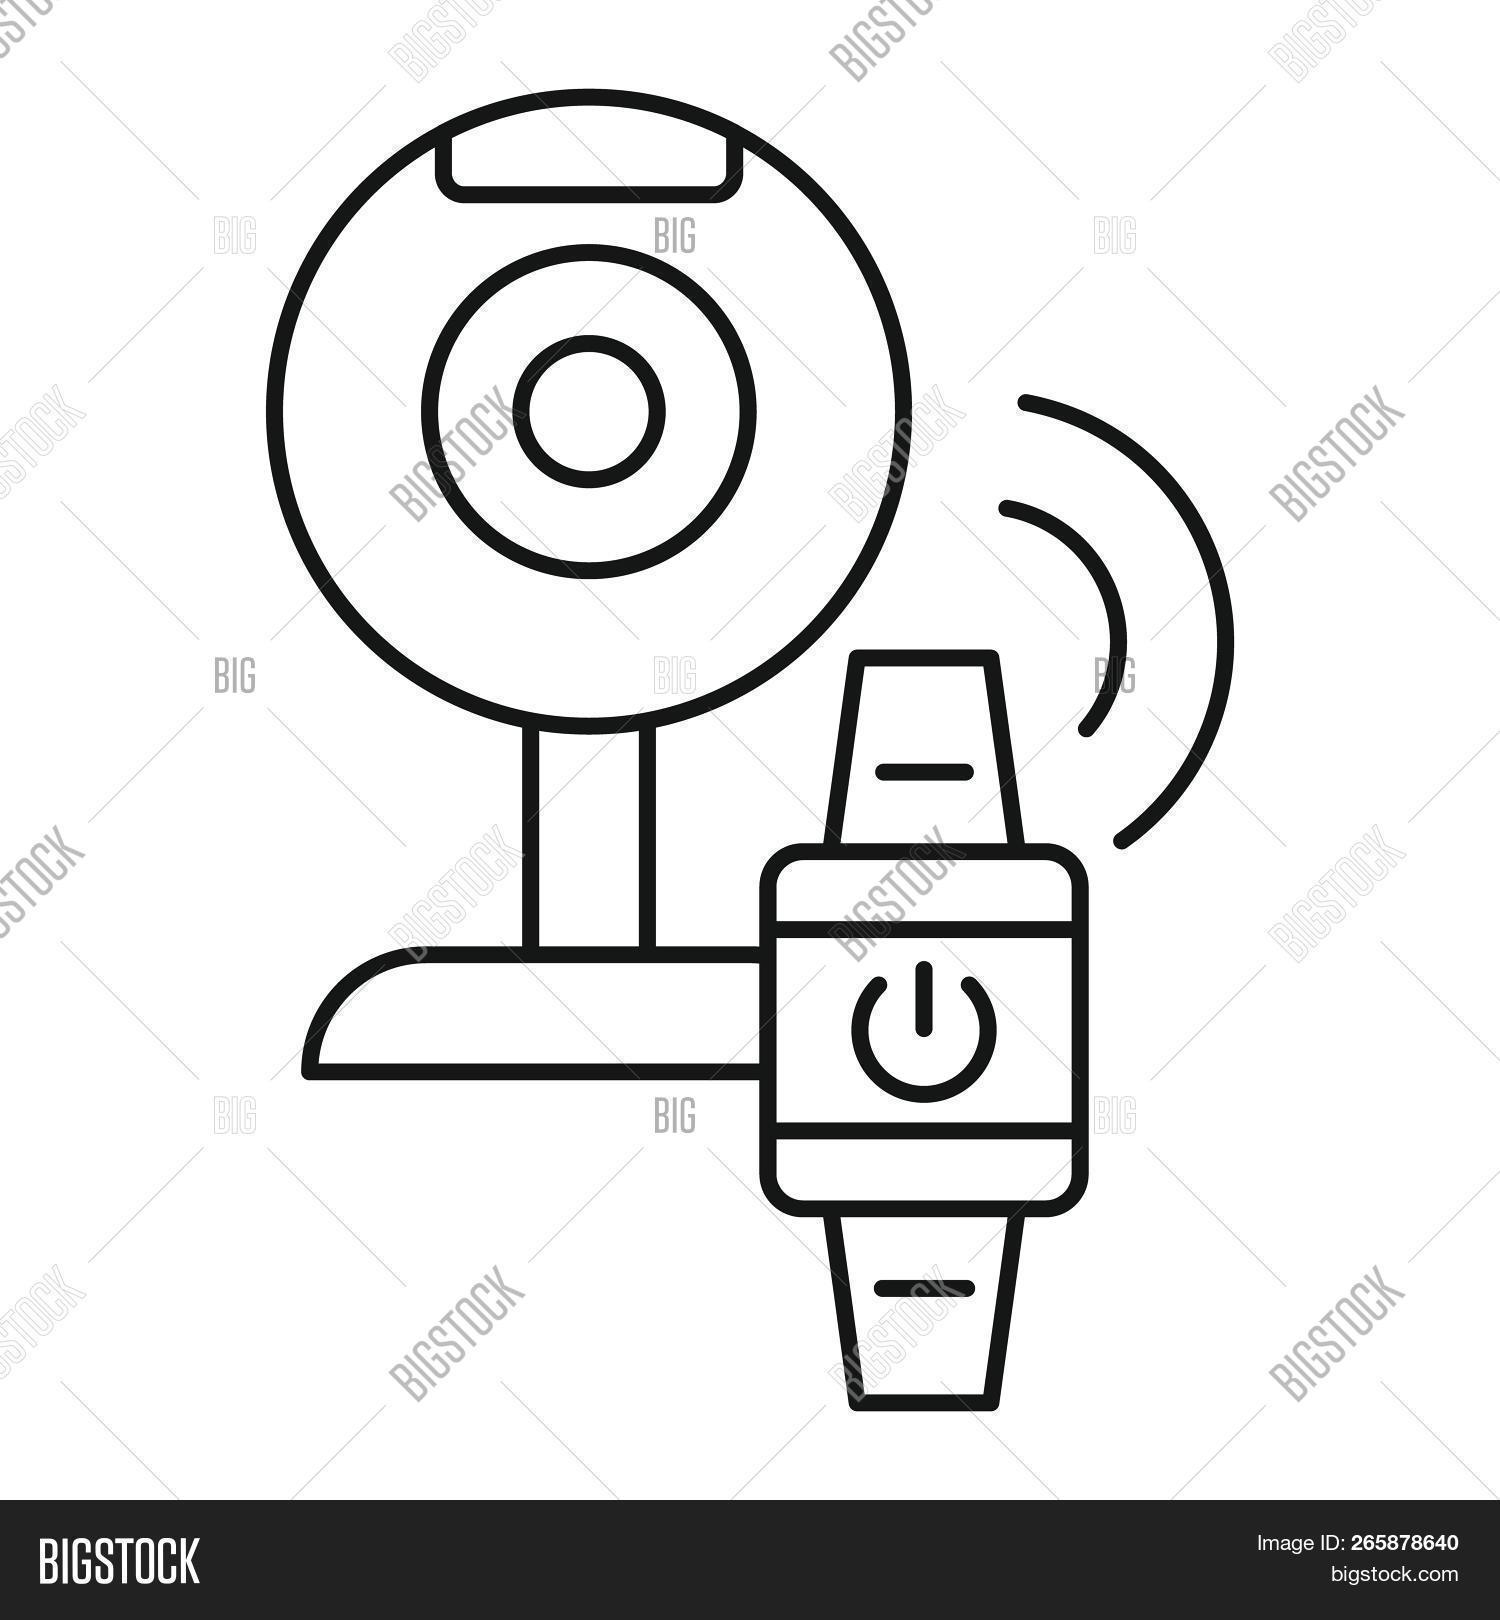 1500x1620 smart web camera icon outline illustration of smart web image